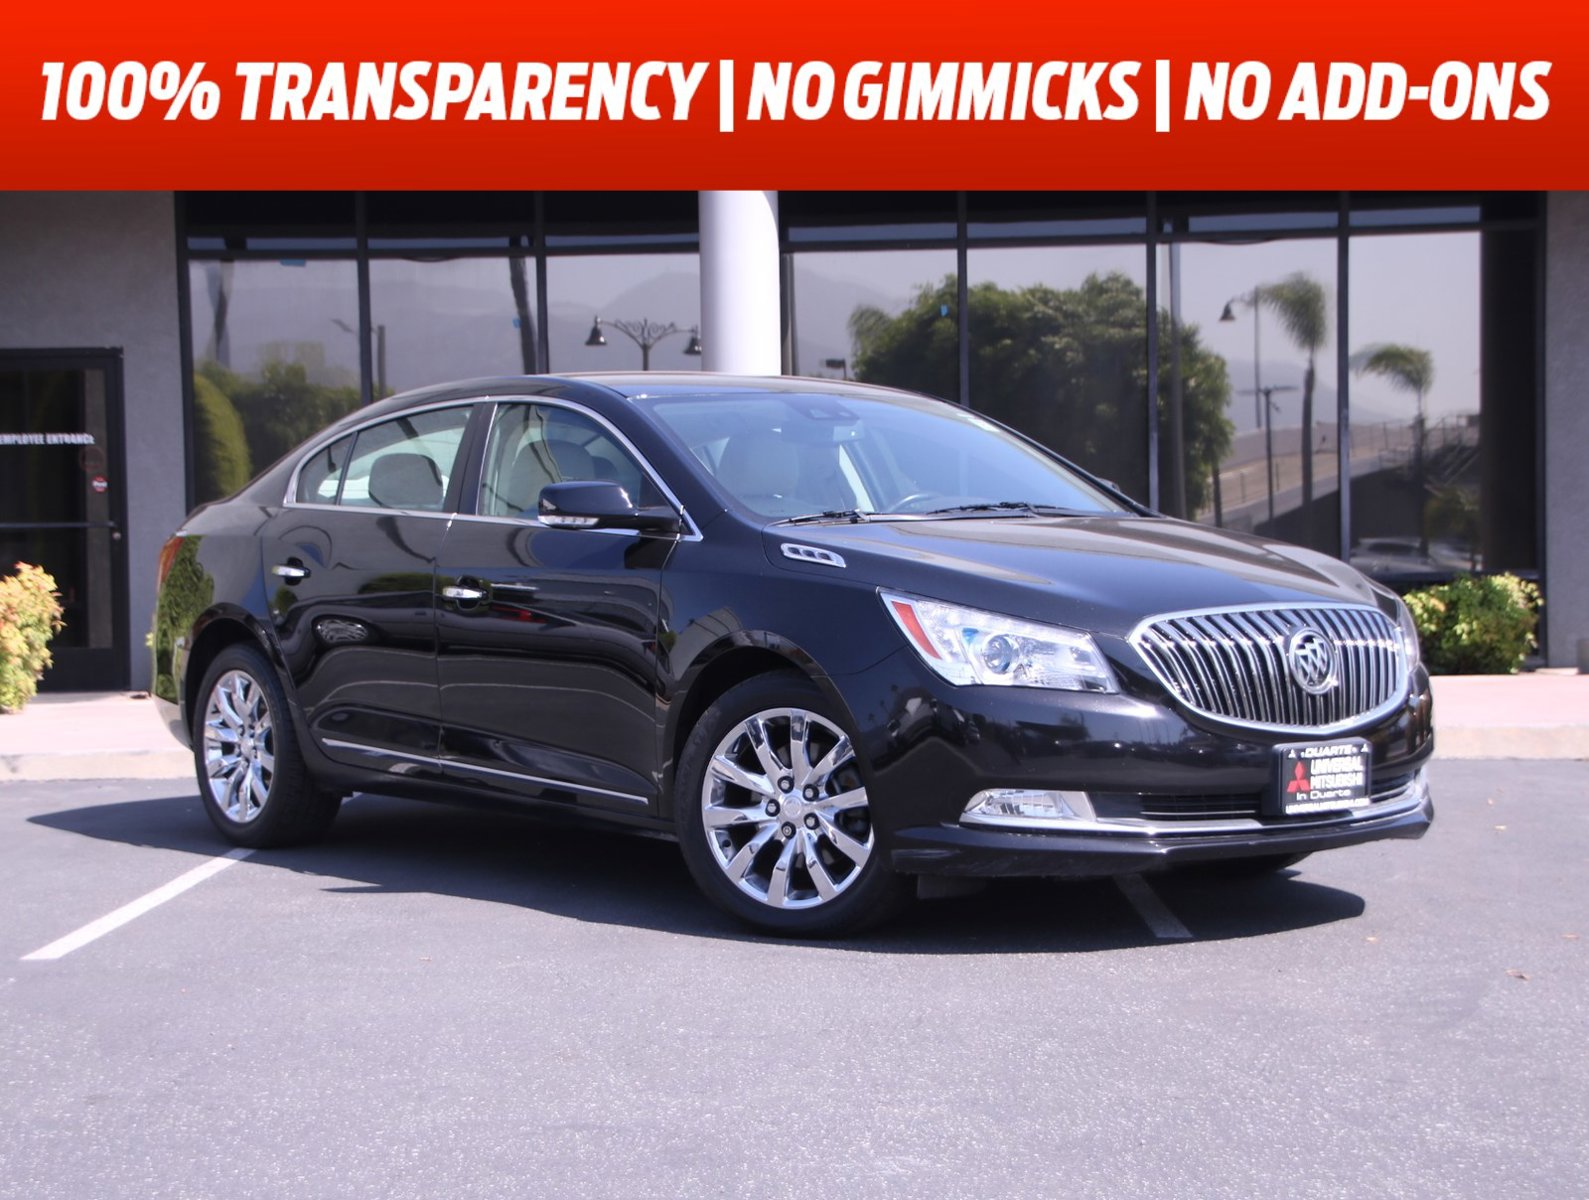 2016 Buick LaCrosse Premium I 4dr Sdn Premium I FWD Gas V6 3.6L/217 [19]